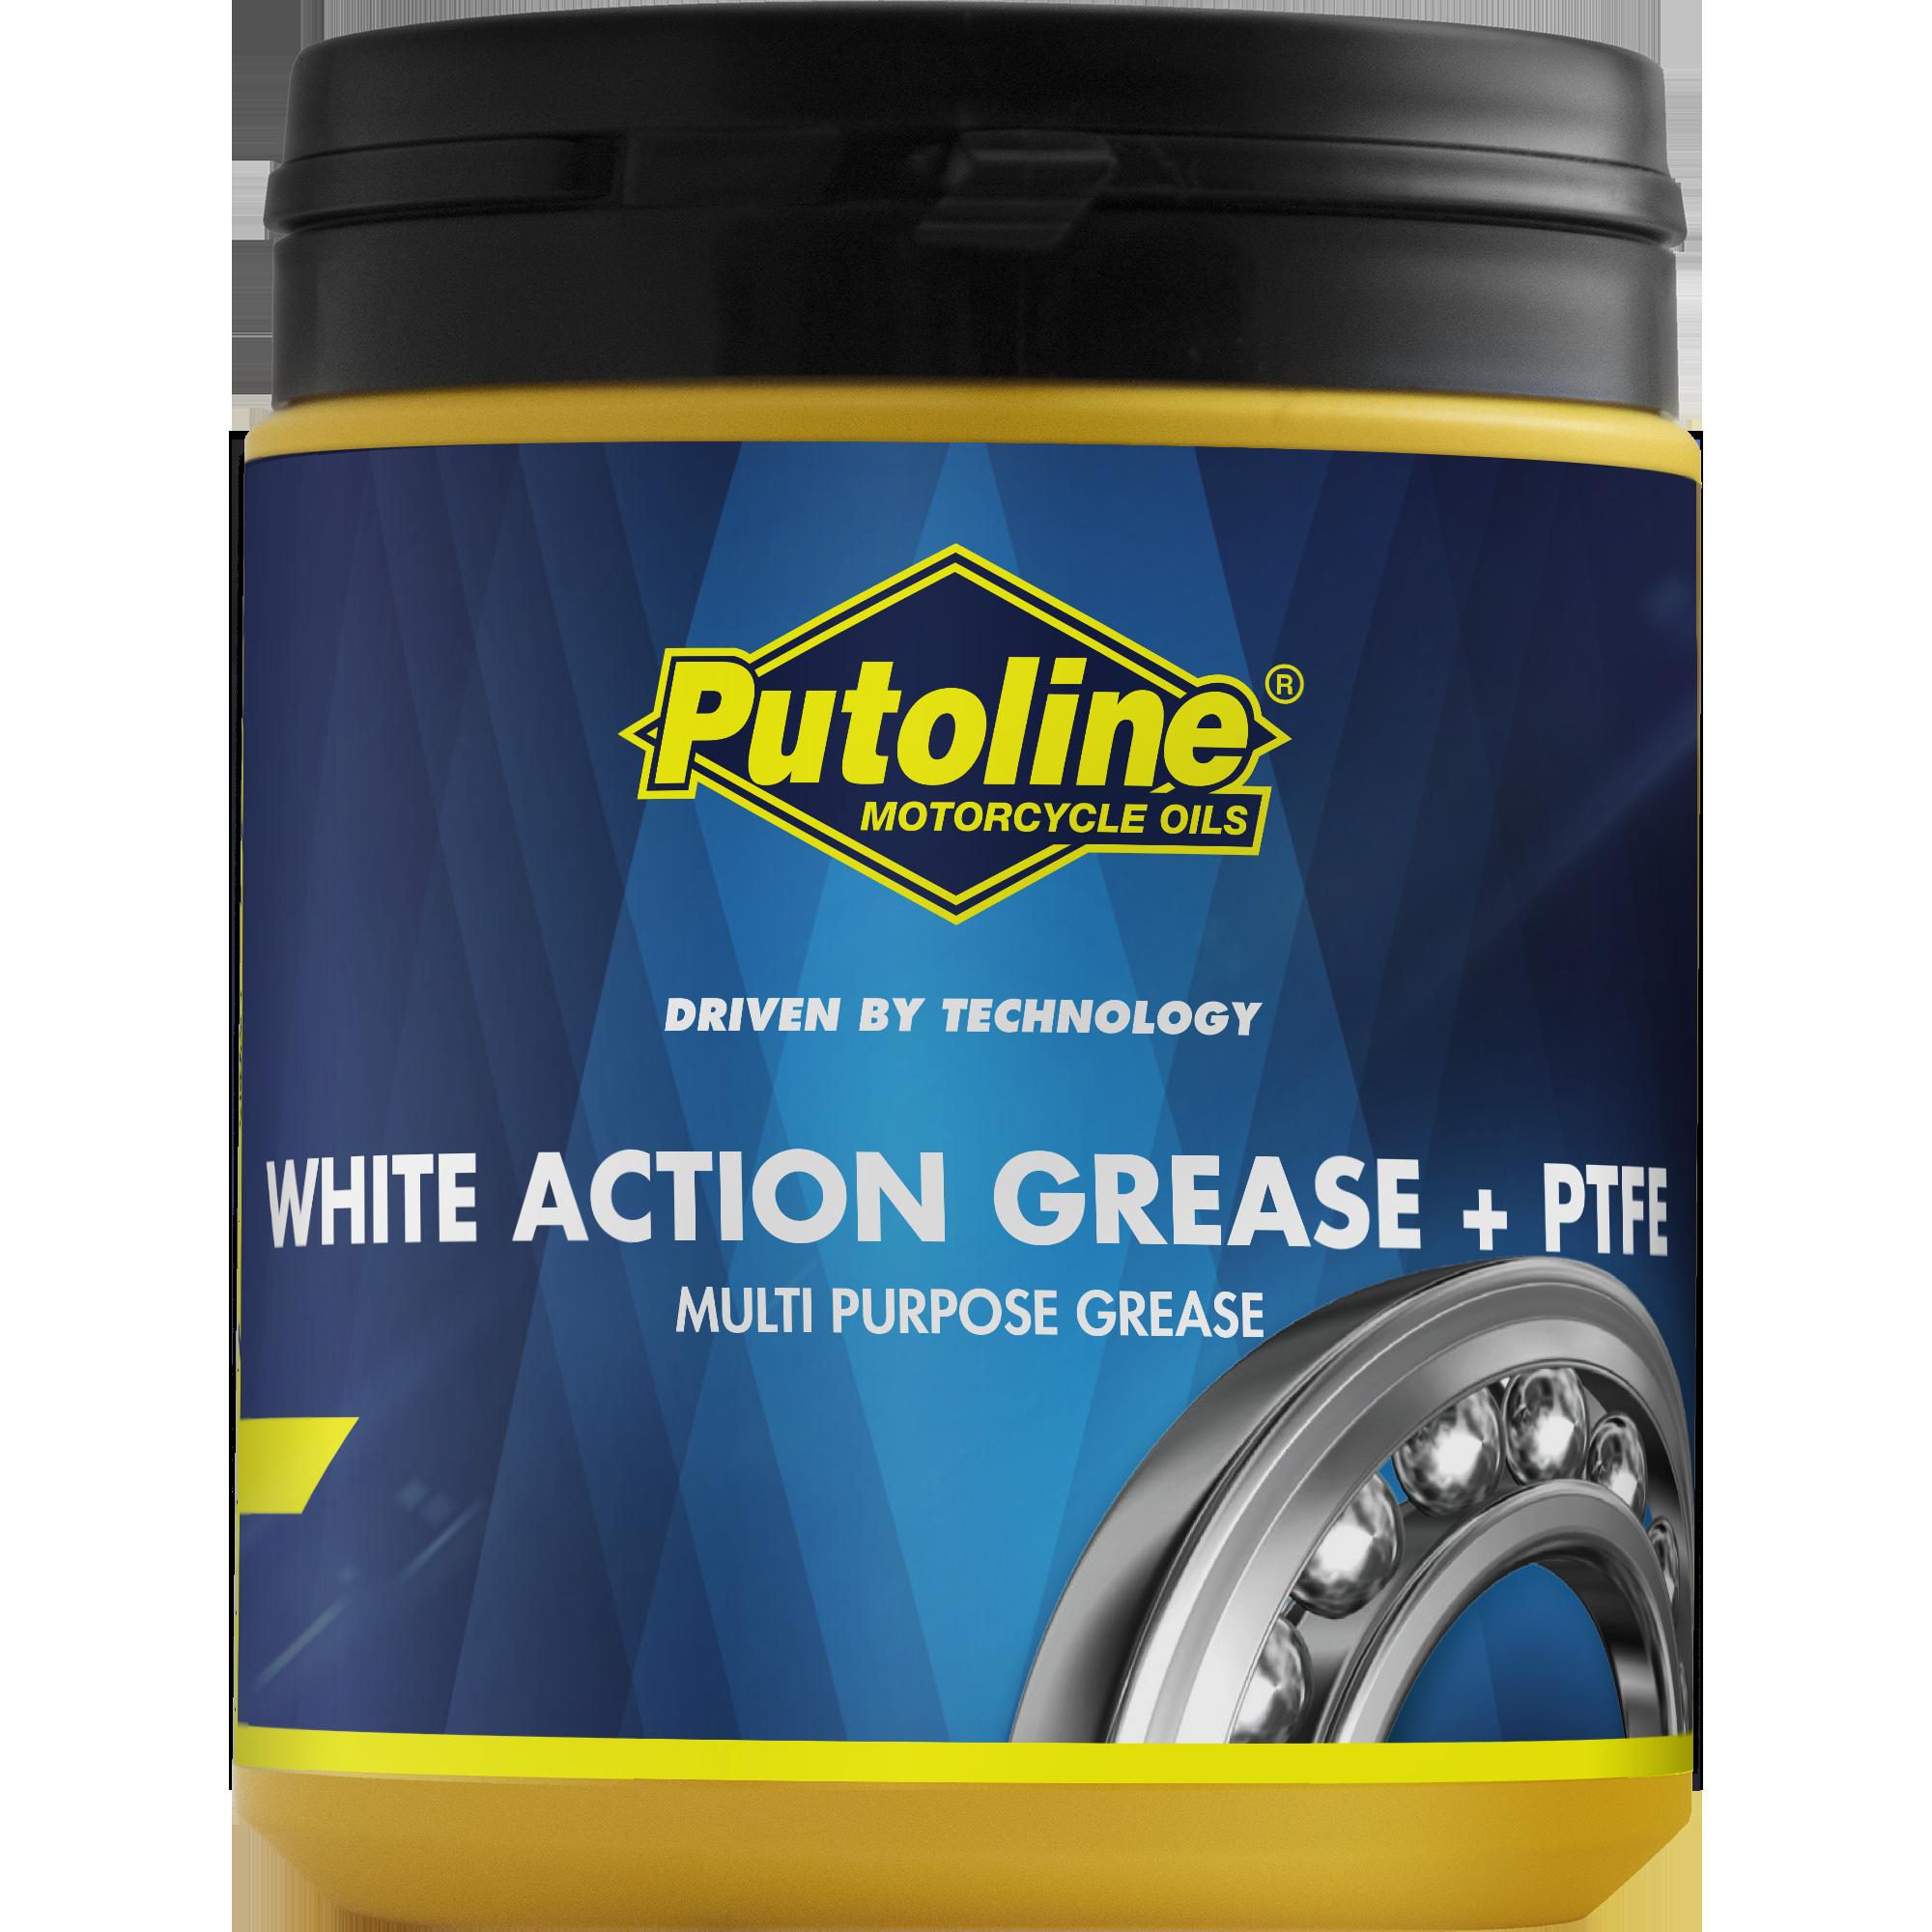 Putoline White Action Grease 600g